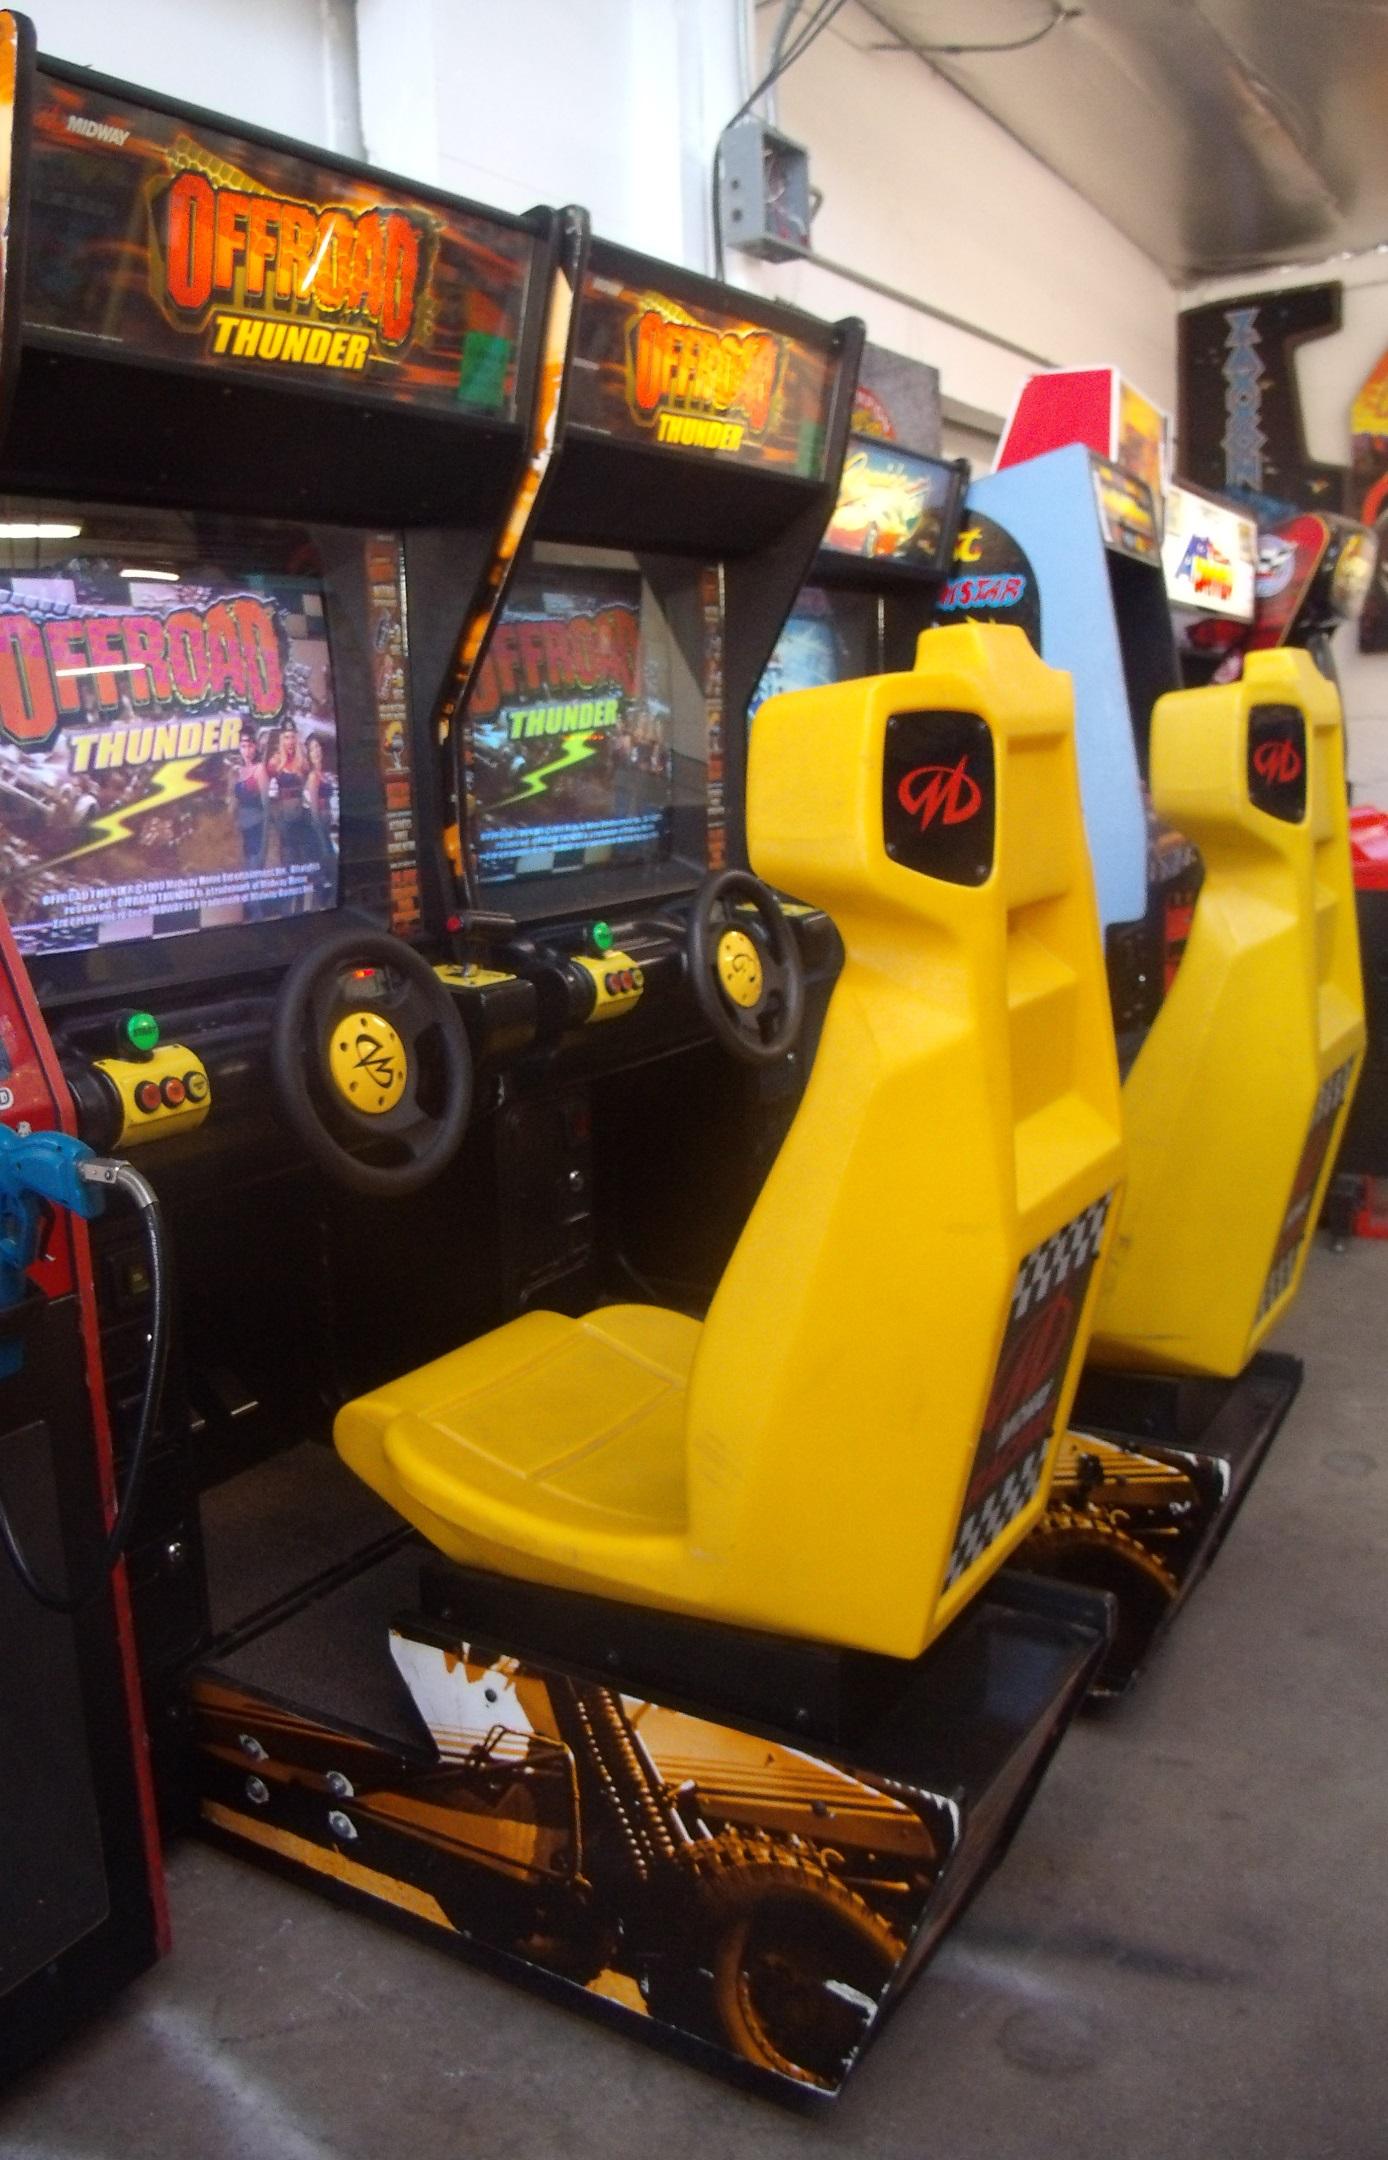 Off Road Thunder Arcade Game Vintage Arcade Superstore